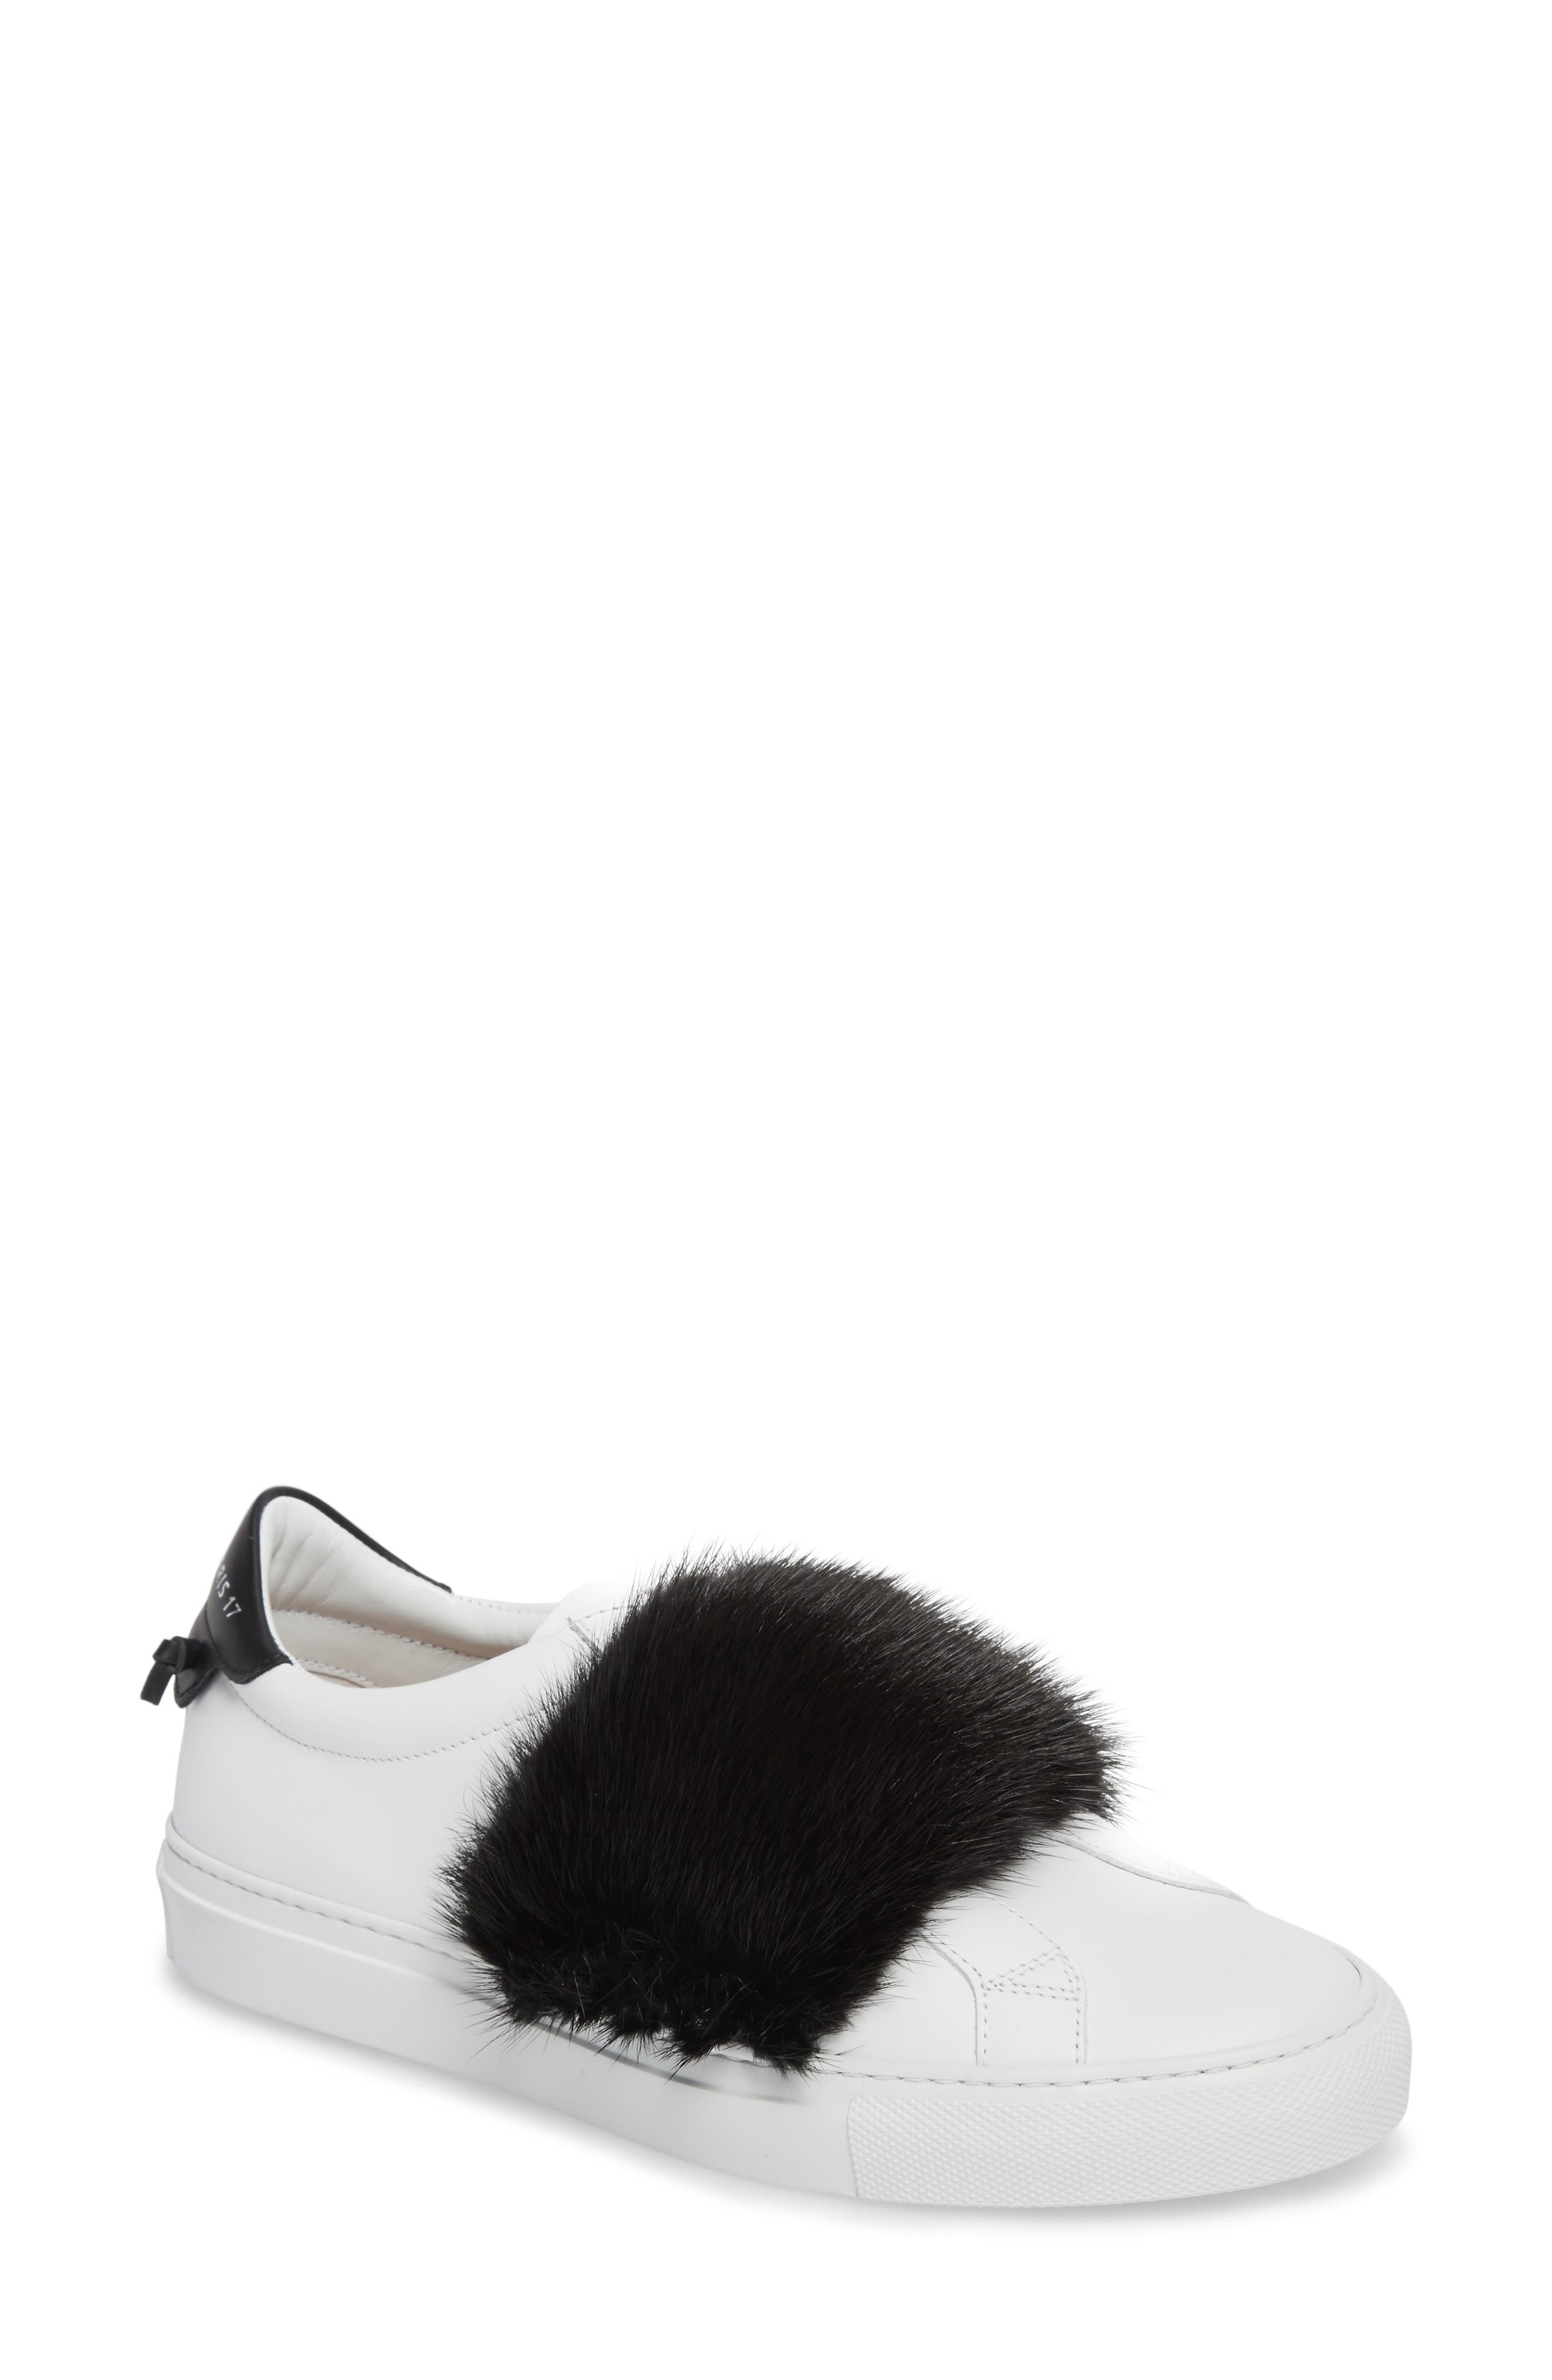 Urban Street Slip-On Sneaker with Genuine Mink Fur Trim,                             Main thumbnail 1, color,